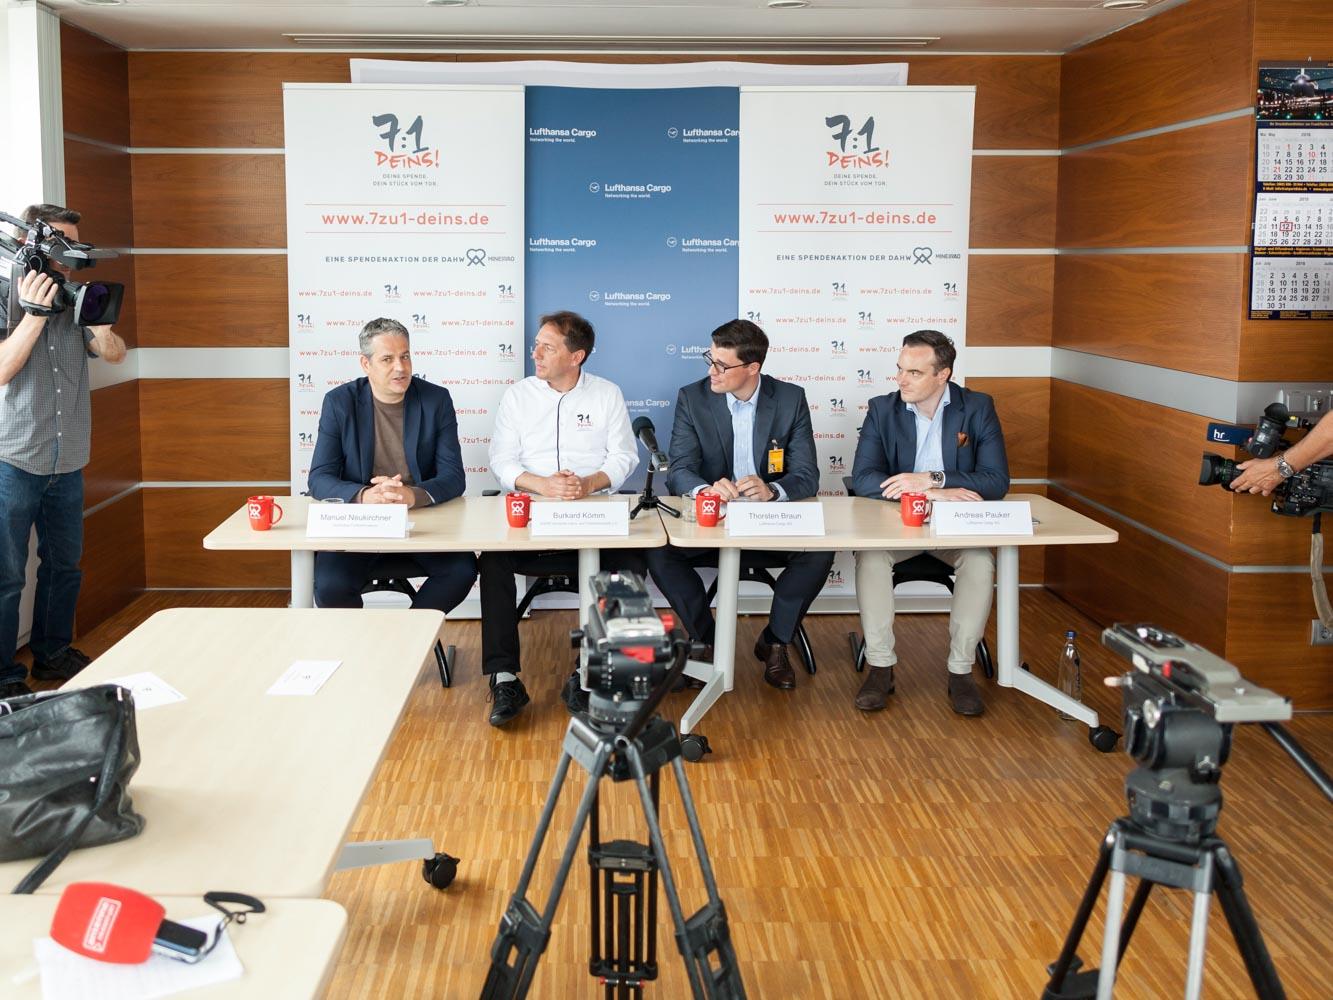 reportage_daniel_kummer-lufthansa_cargo_dahw_2018-02